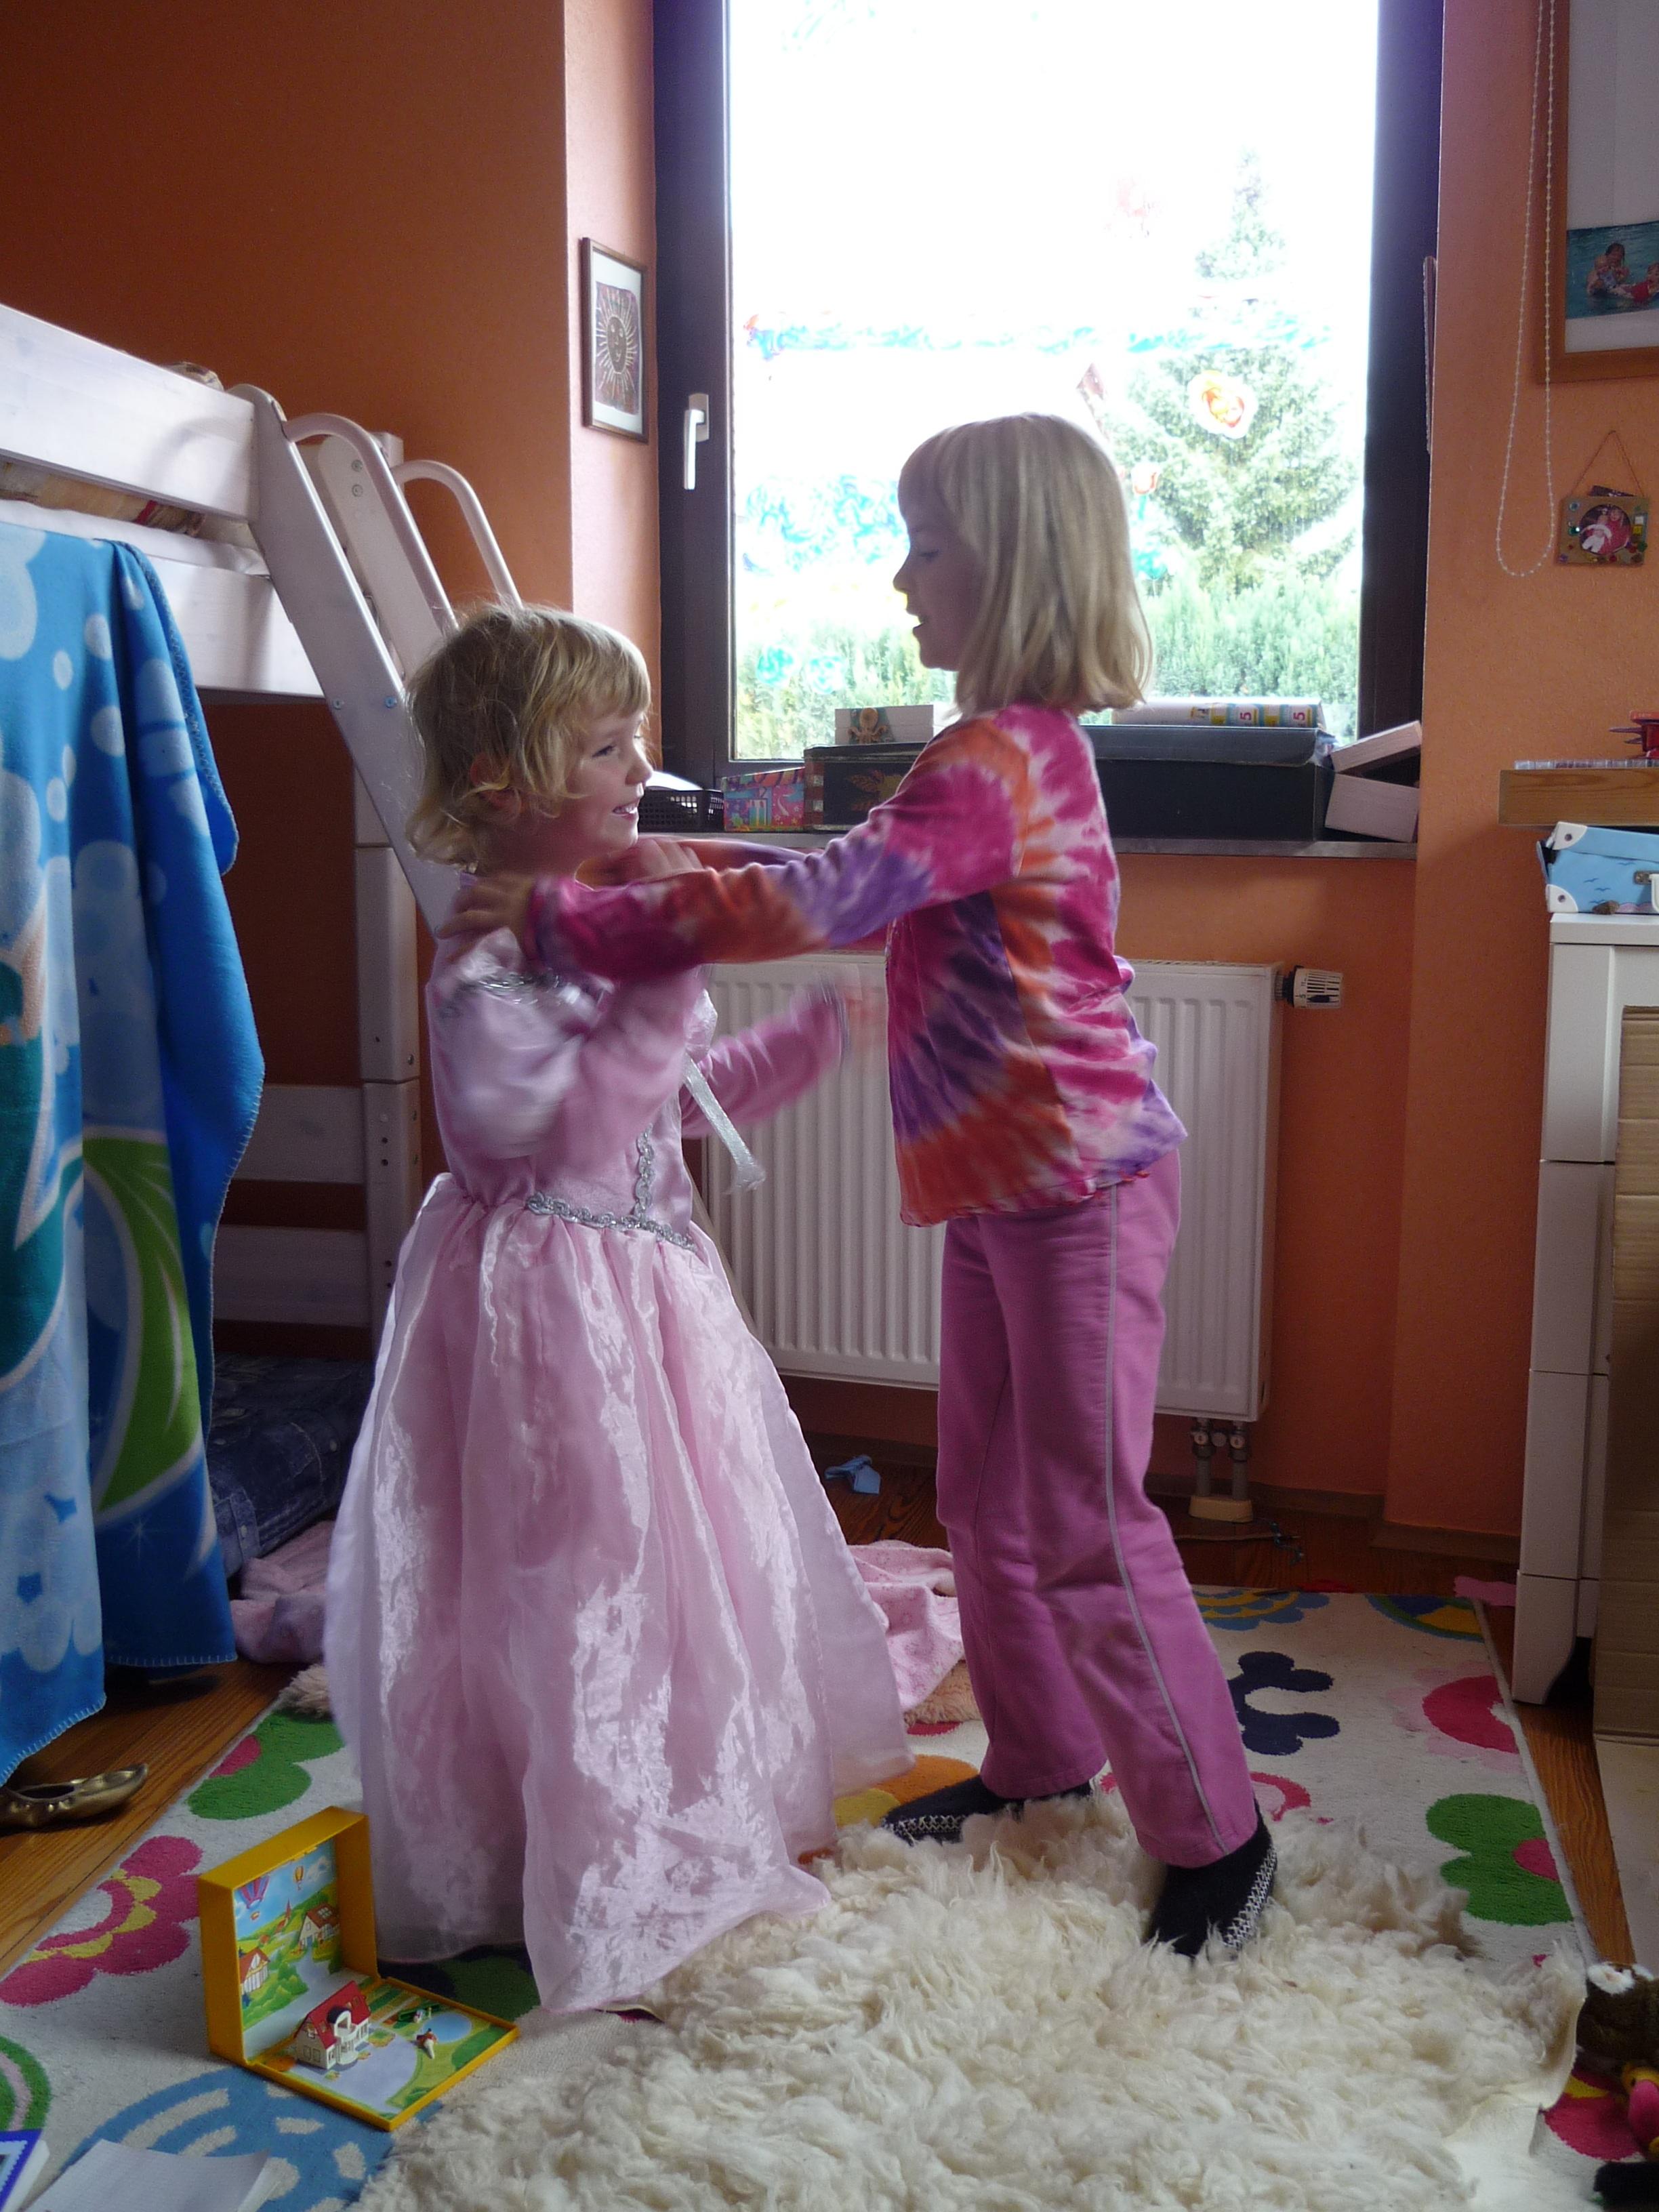 flirting games for kids girls room free play